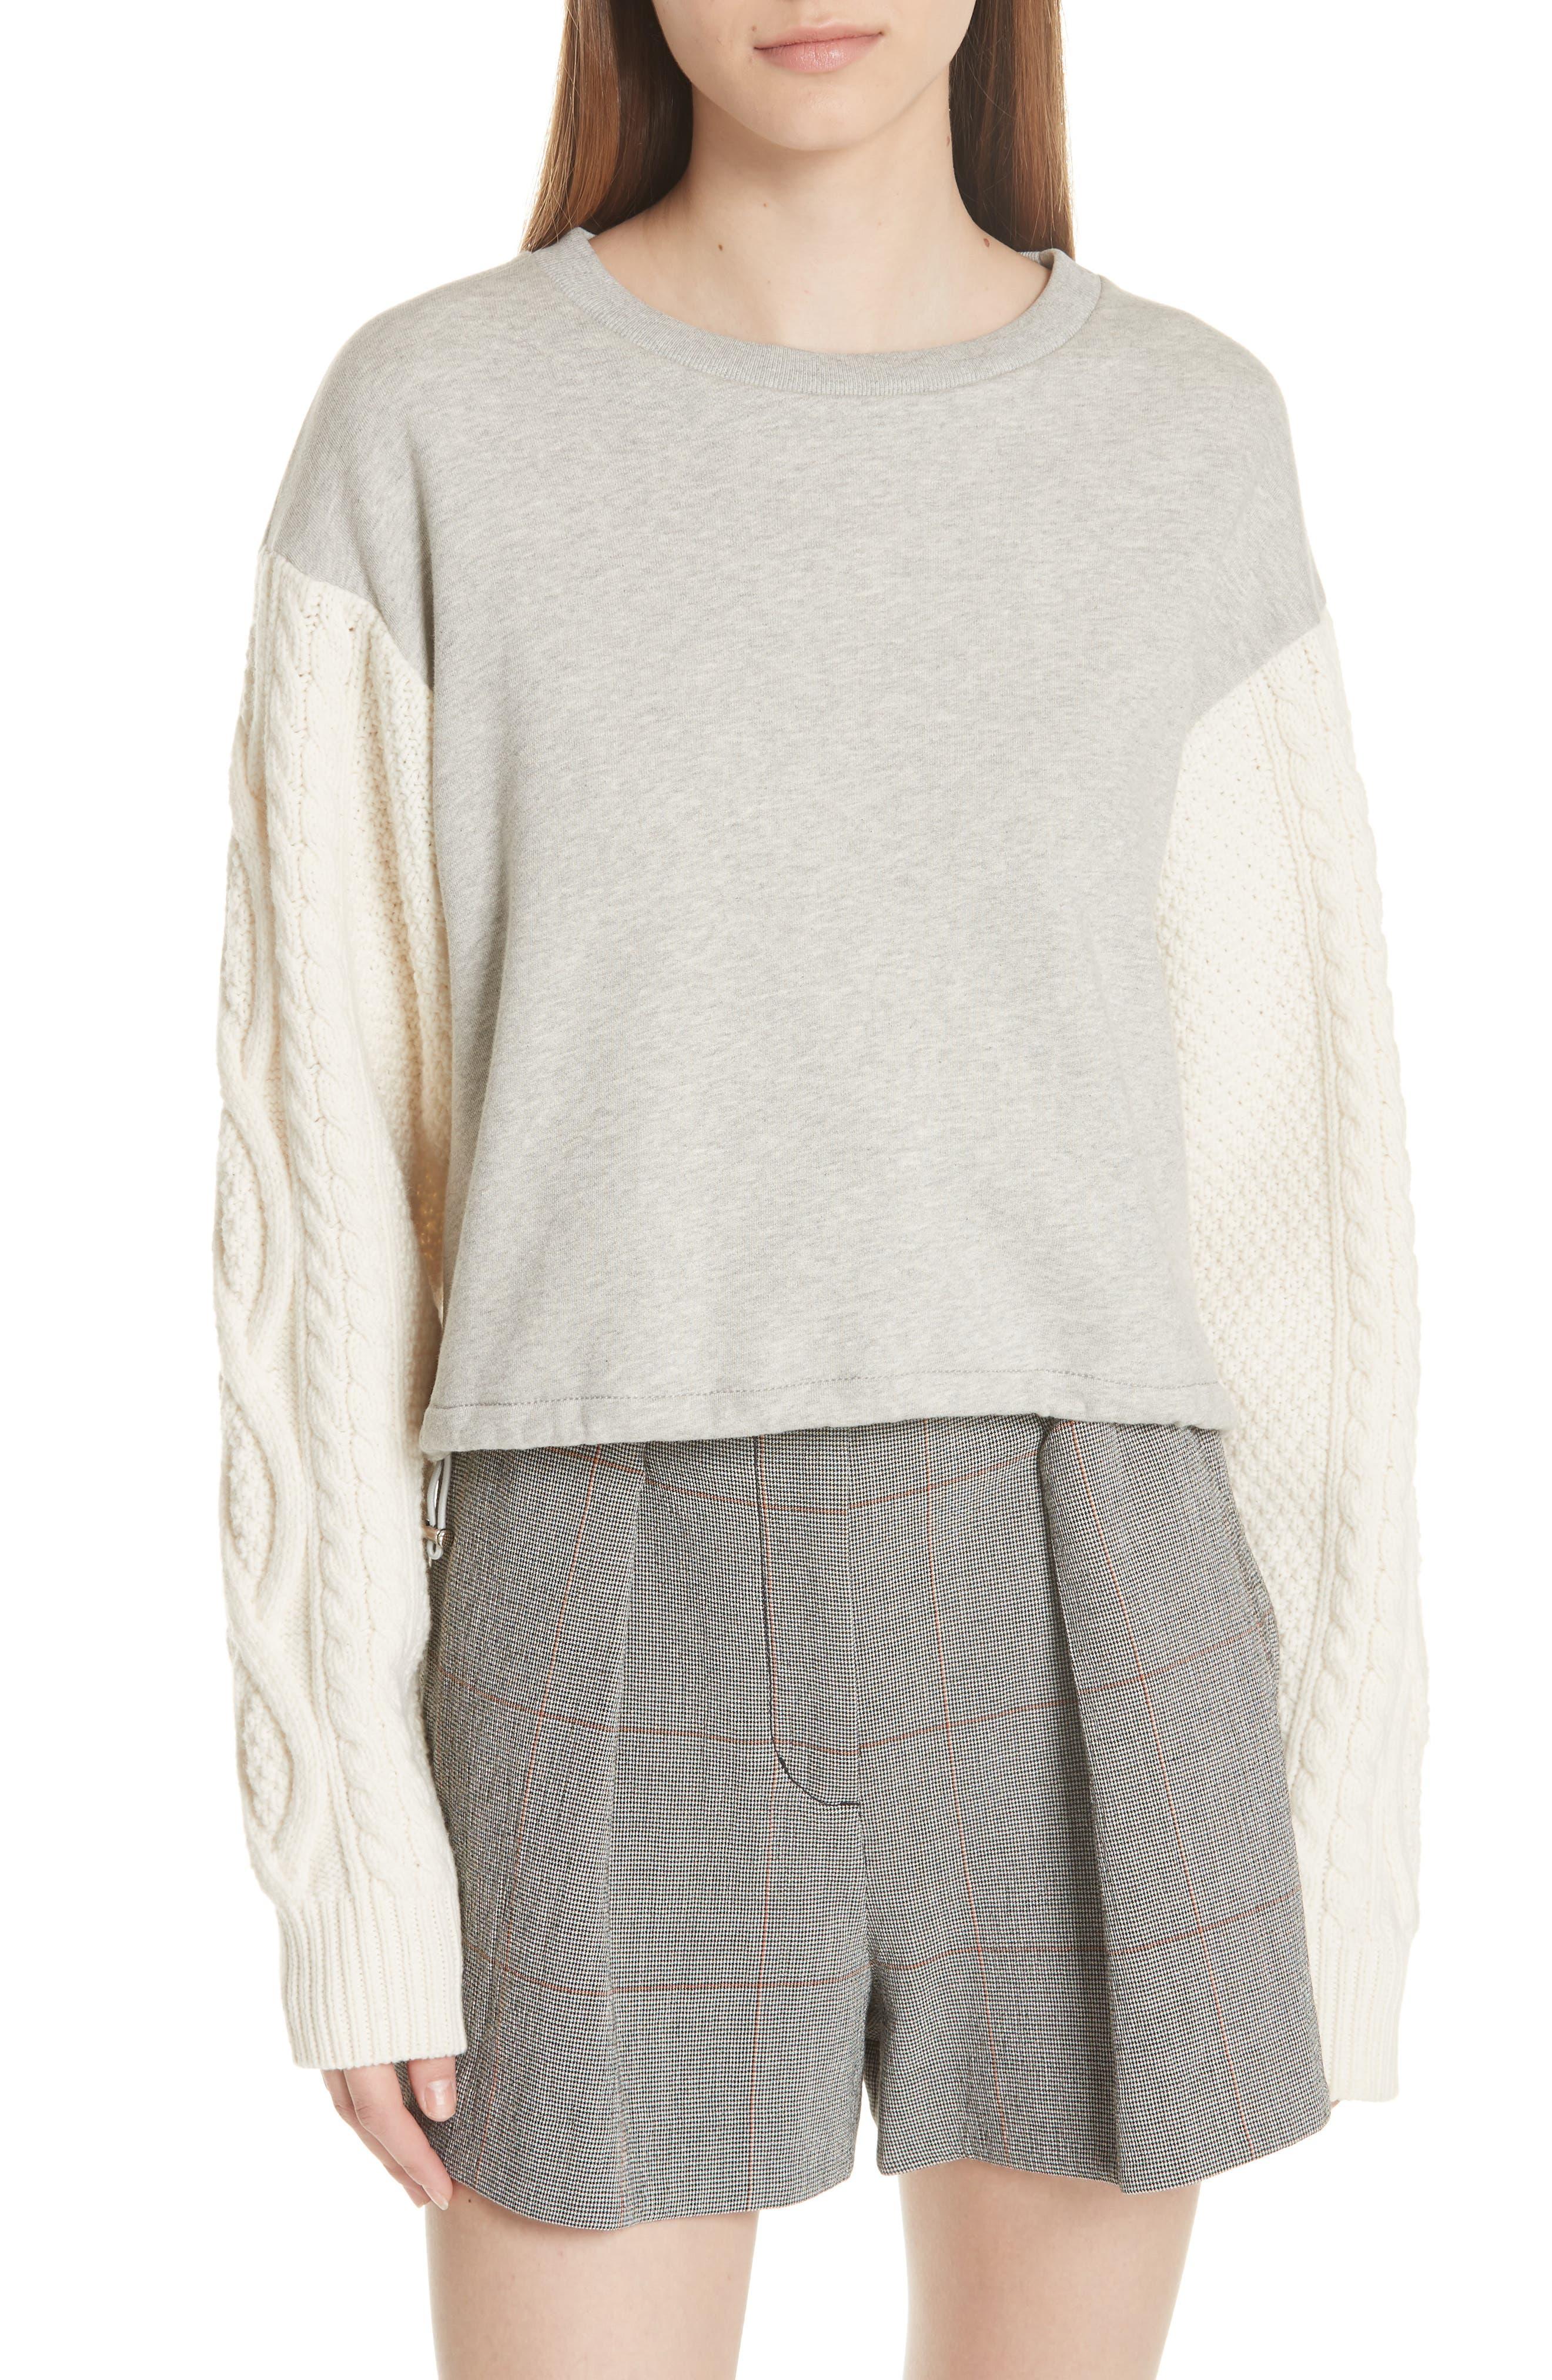 3.1 Phillip Lim Cable Knit Sleeve Sweatshirt, Grey